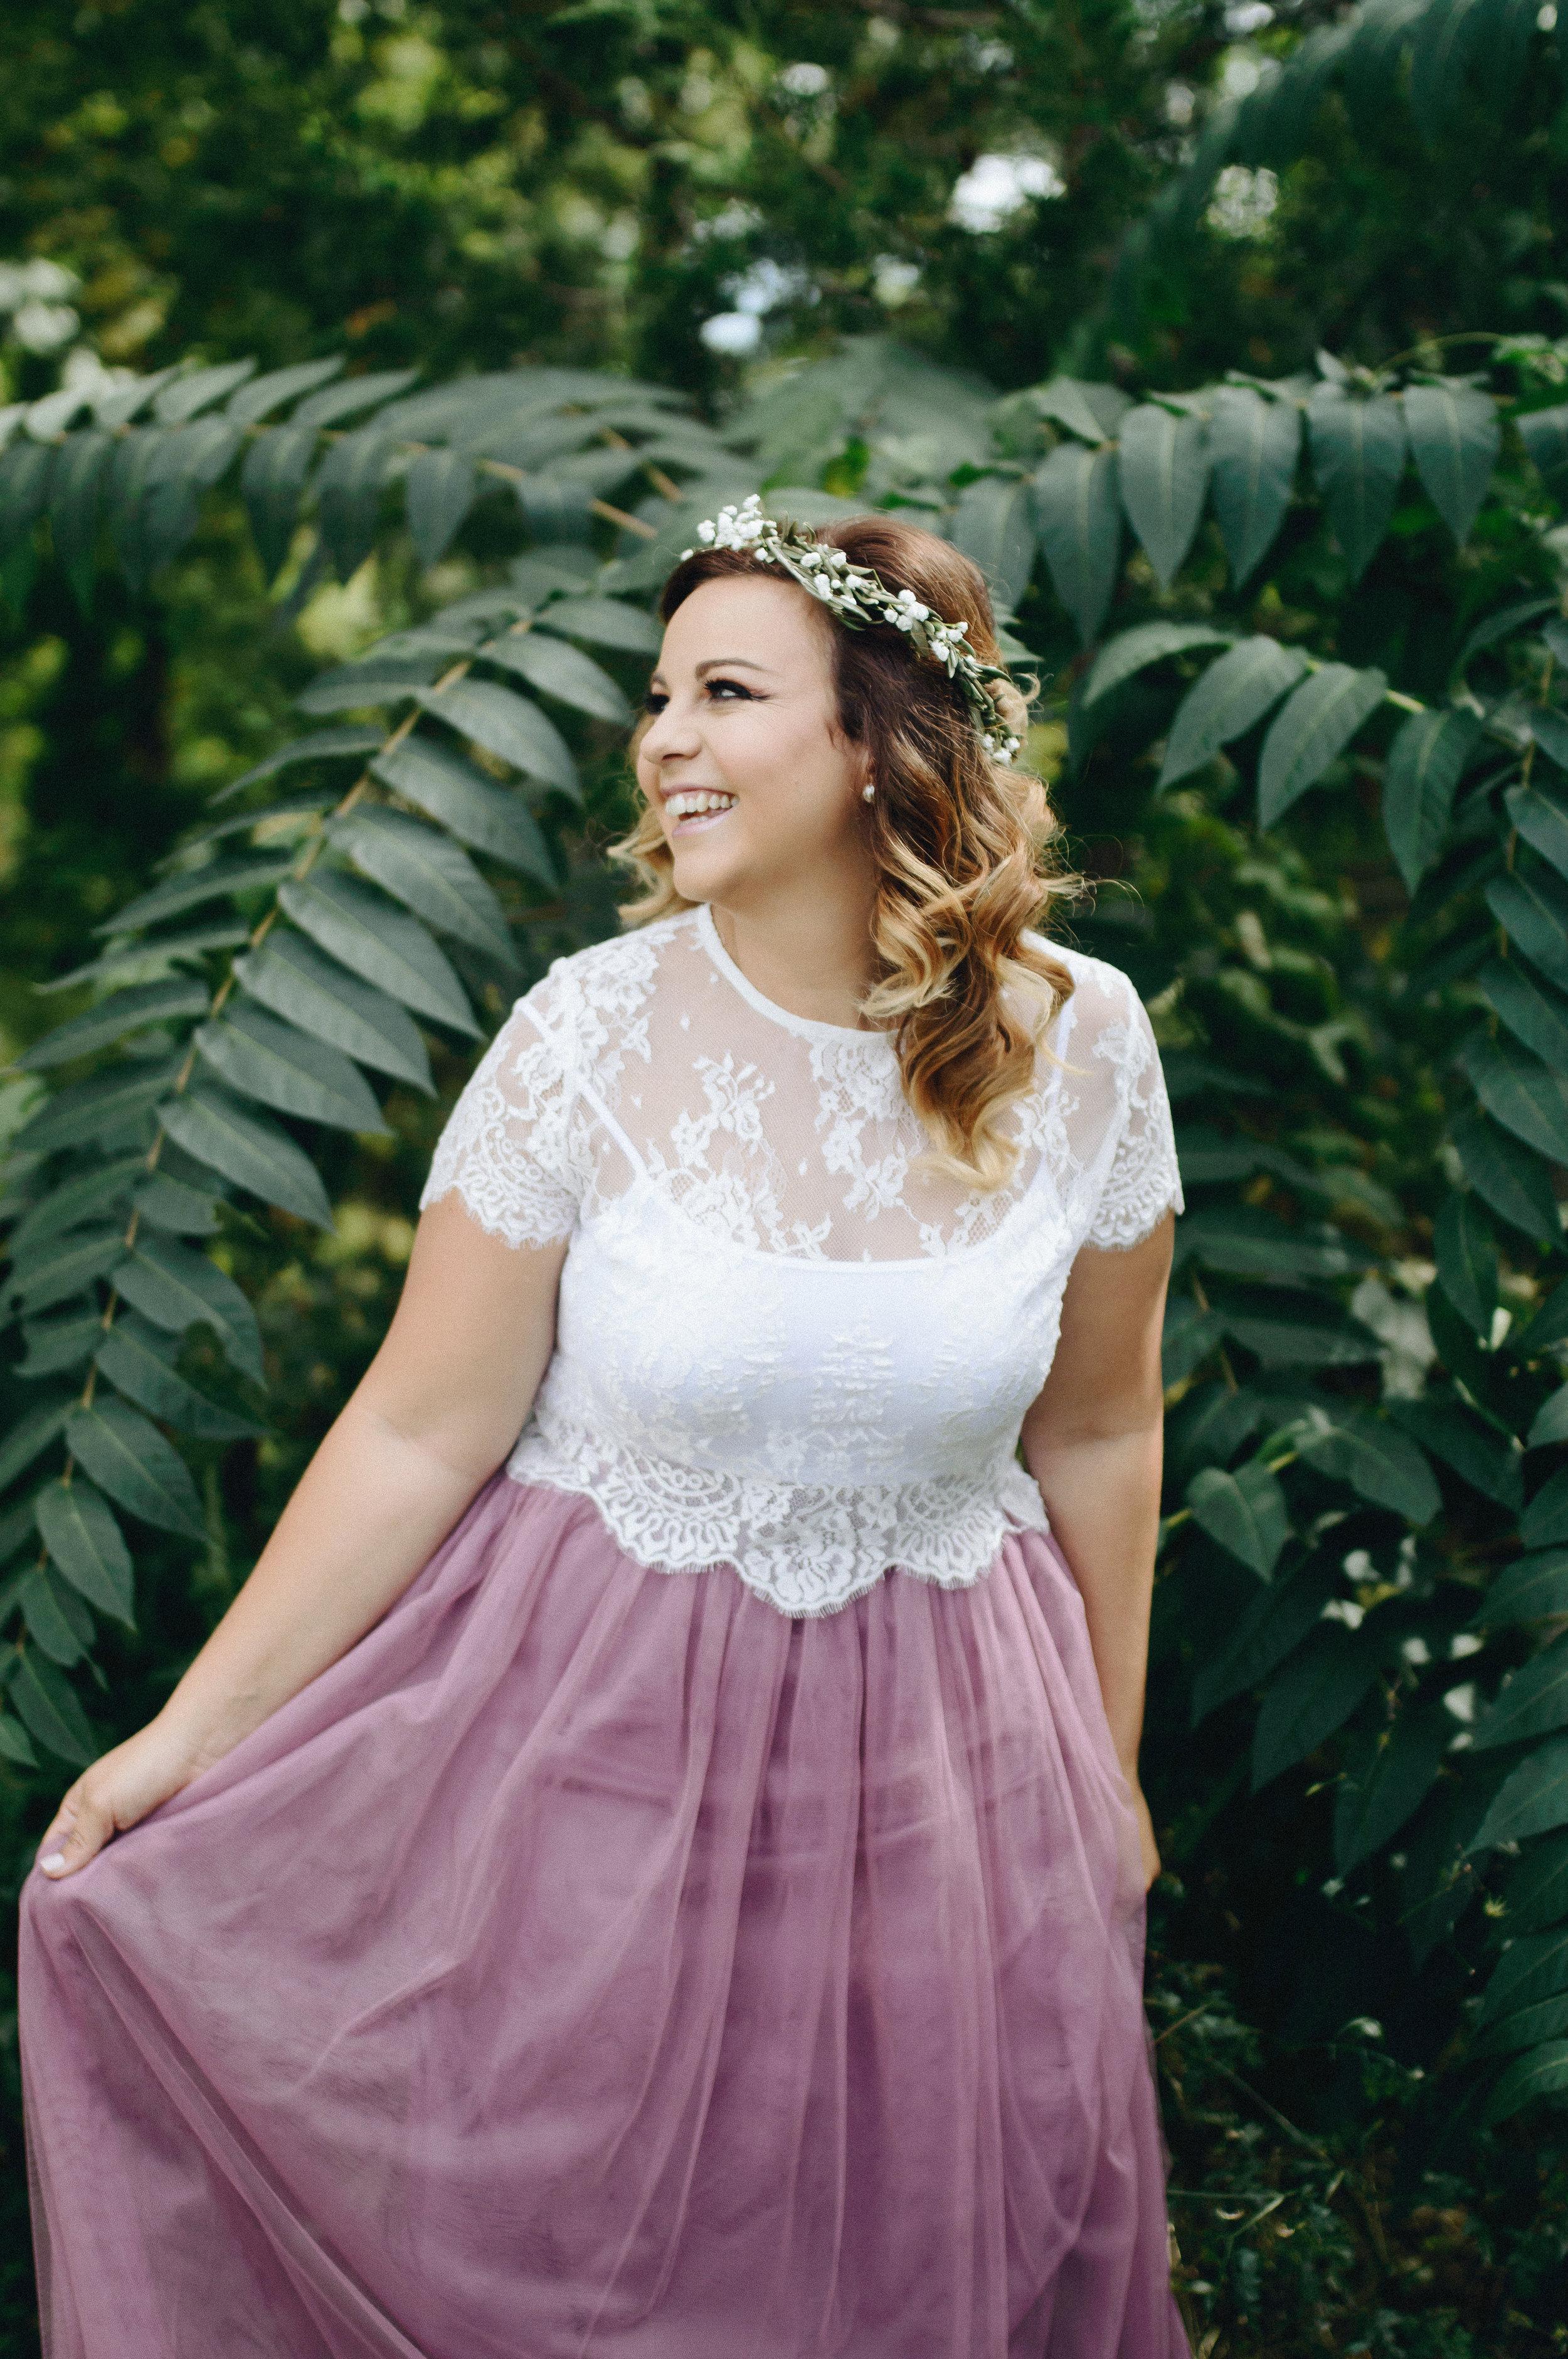 Lauren_Dustin_Wedding - EDITS-3.jpg